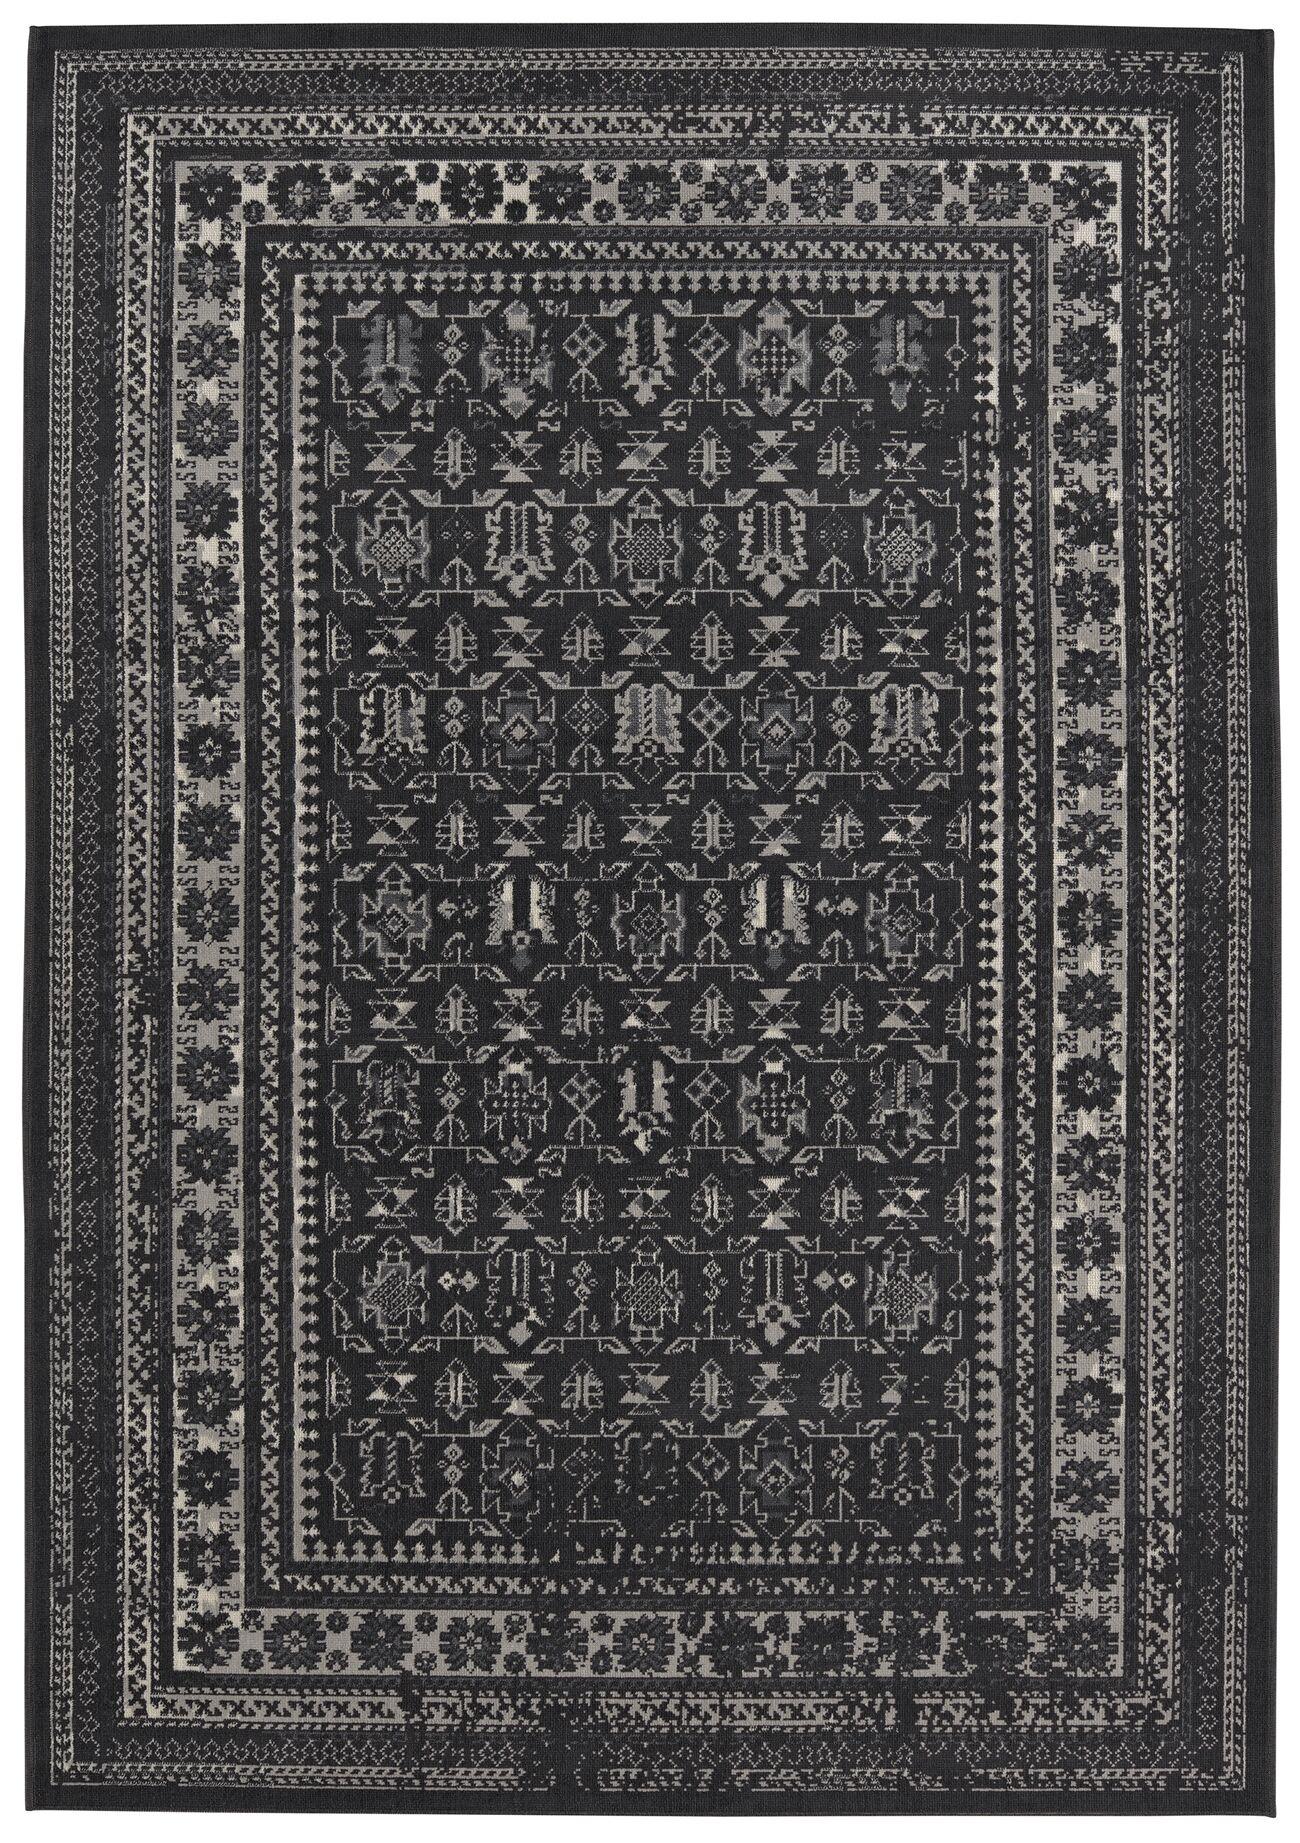 Gildea Black Area Rug Rug Size: Rectangle 7'10